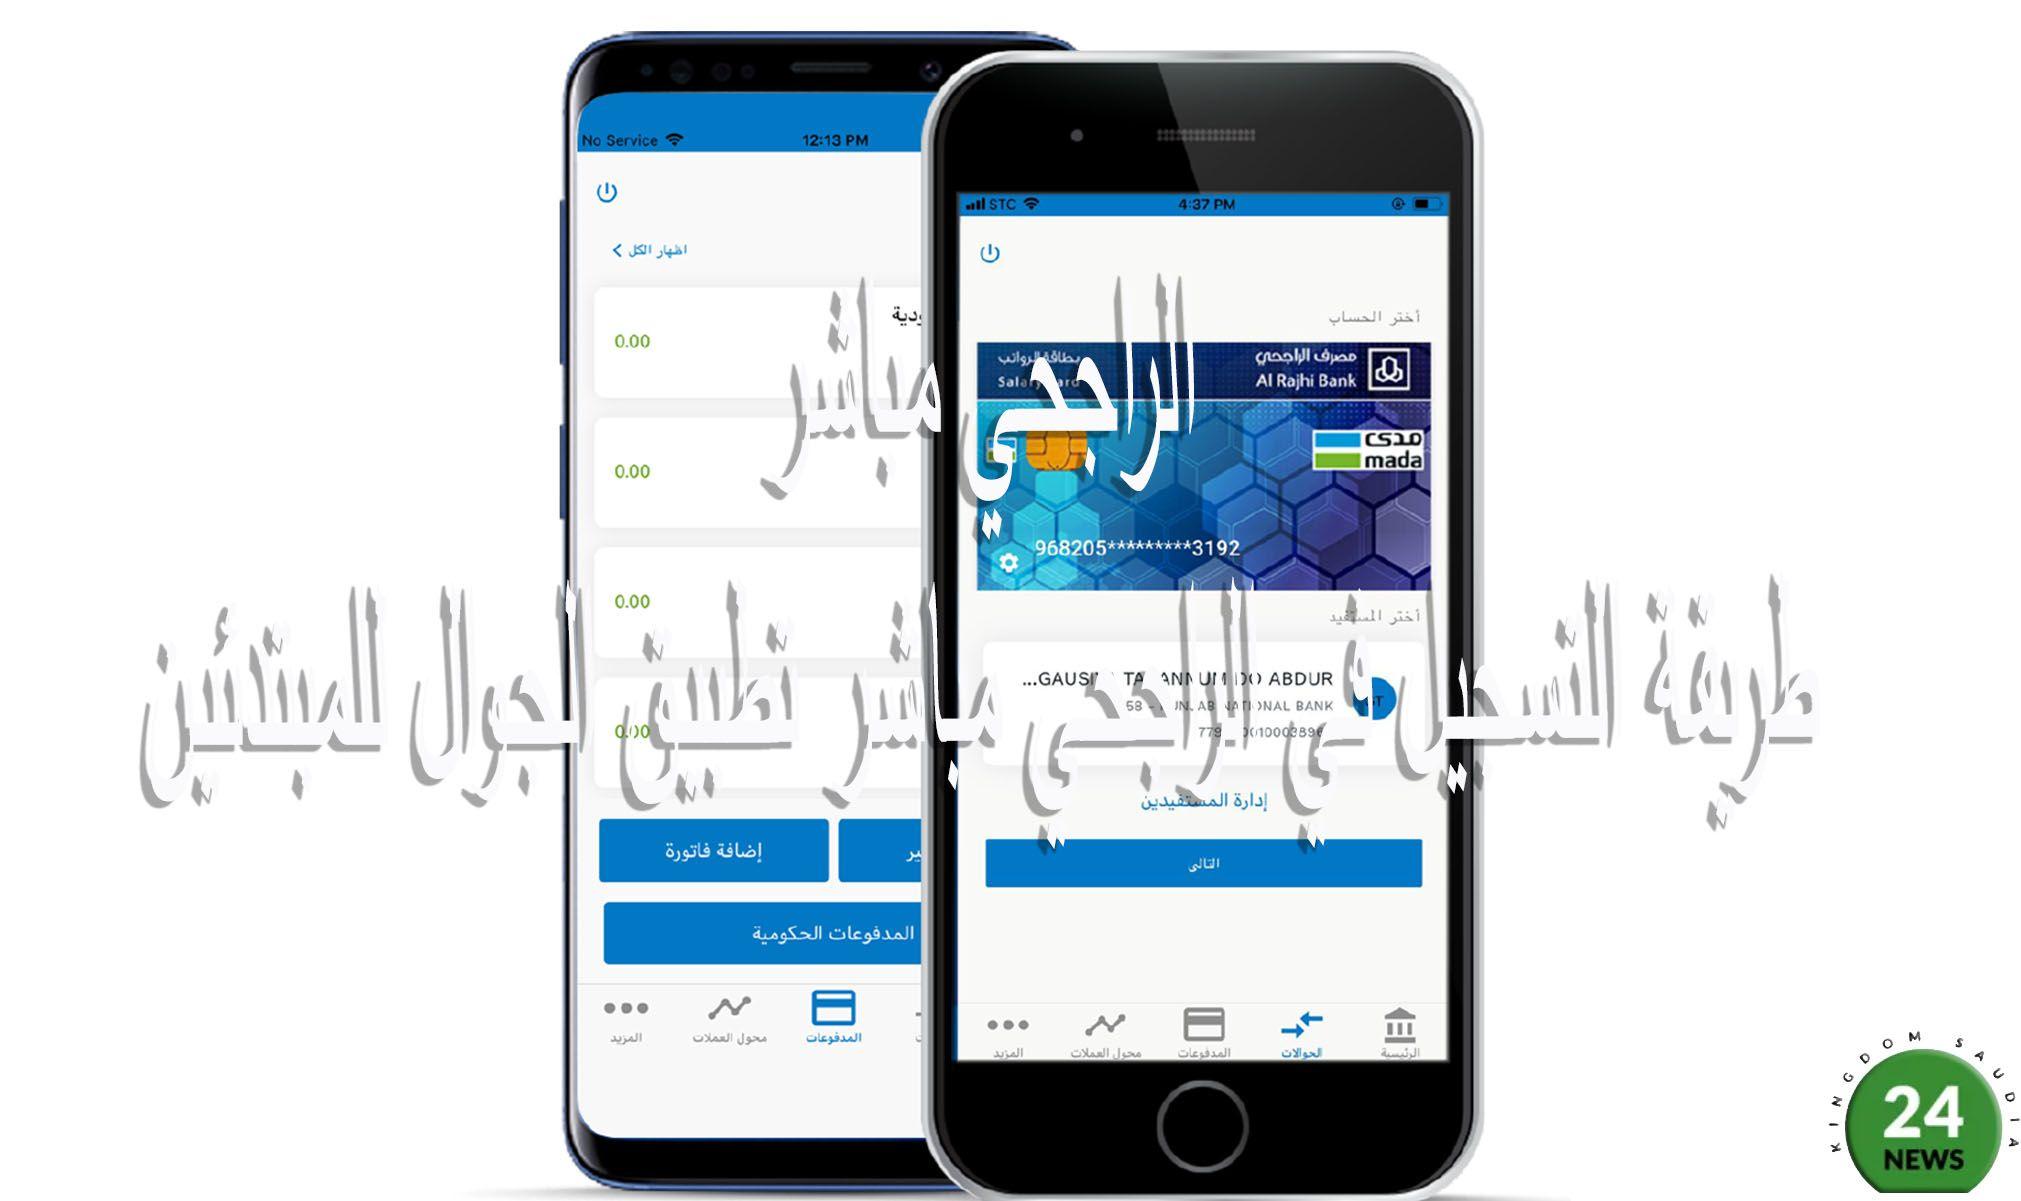 الراجحي مباشر طريقة التسجيل في الراجحي مباشر تطبيق الجوال للمبتدئين Electronics Trading Electronic Products